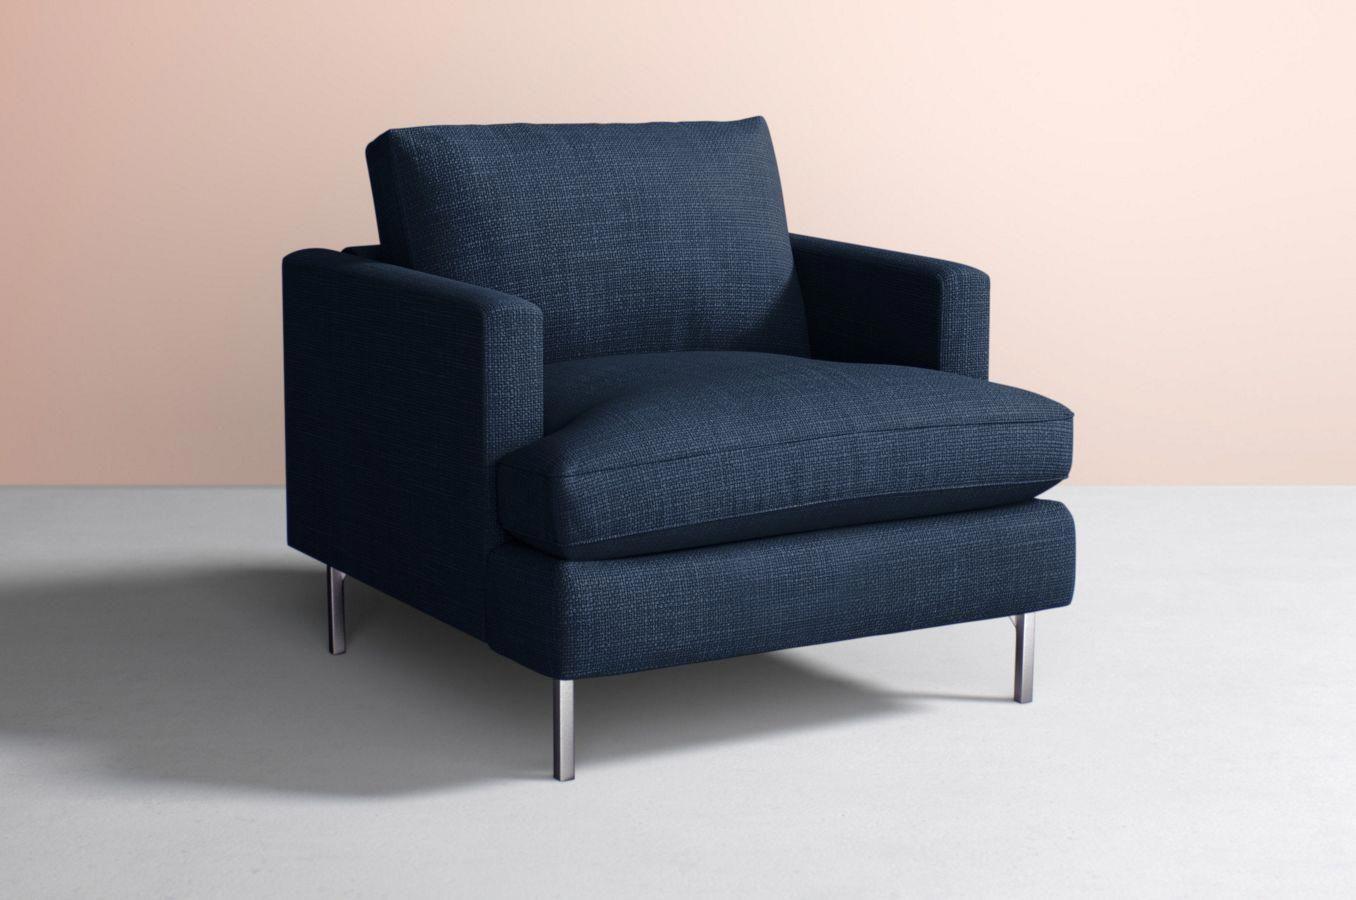 oversized overstuffed chair luxurychairsforoffice  chair